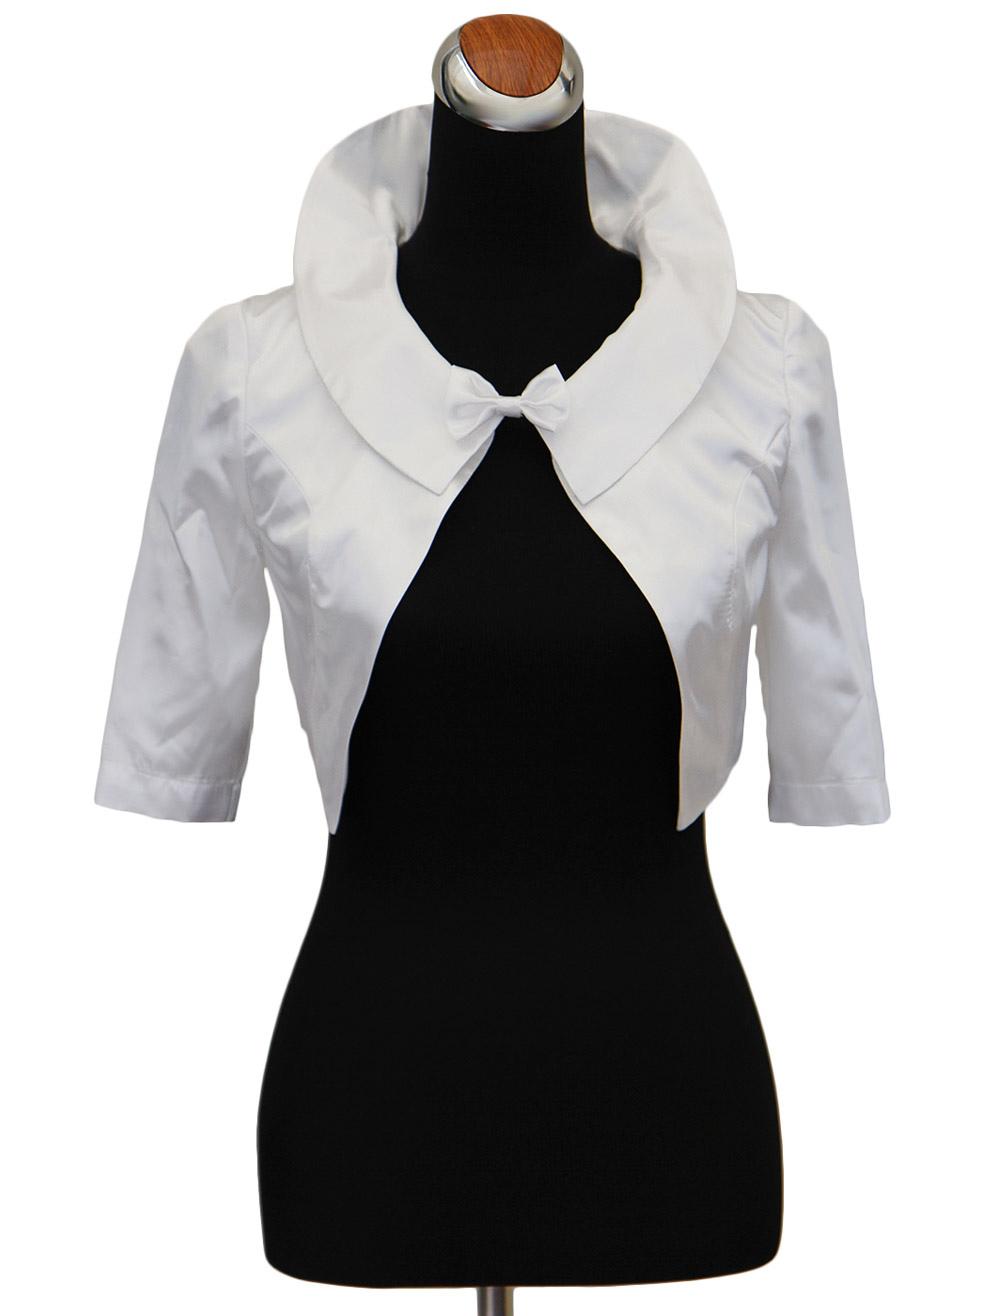 White 3/4 Length Bell Sleeves Matte Satin Bridal Wedding Shawl